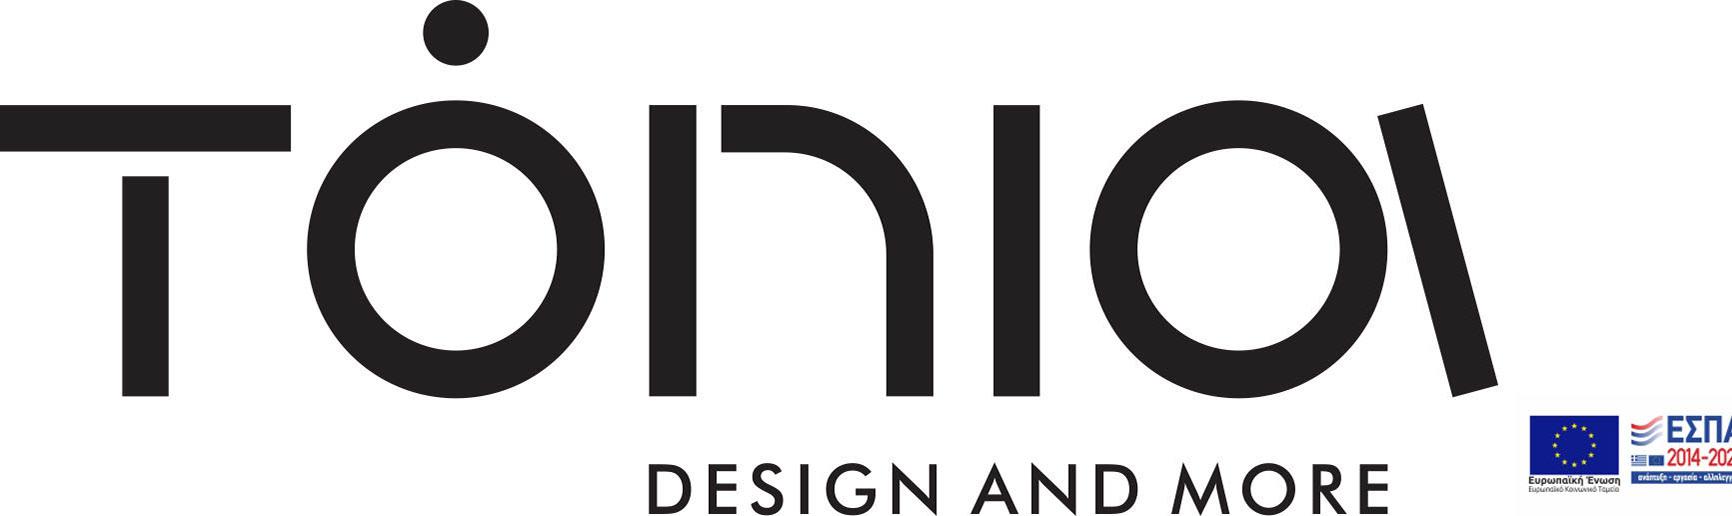 Tonia Tegou Design and more